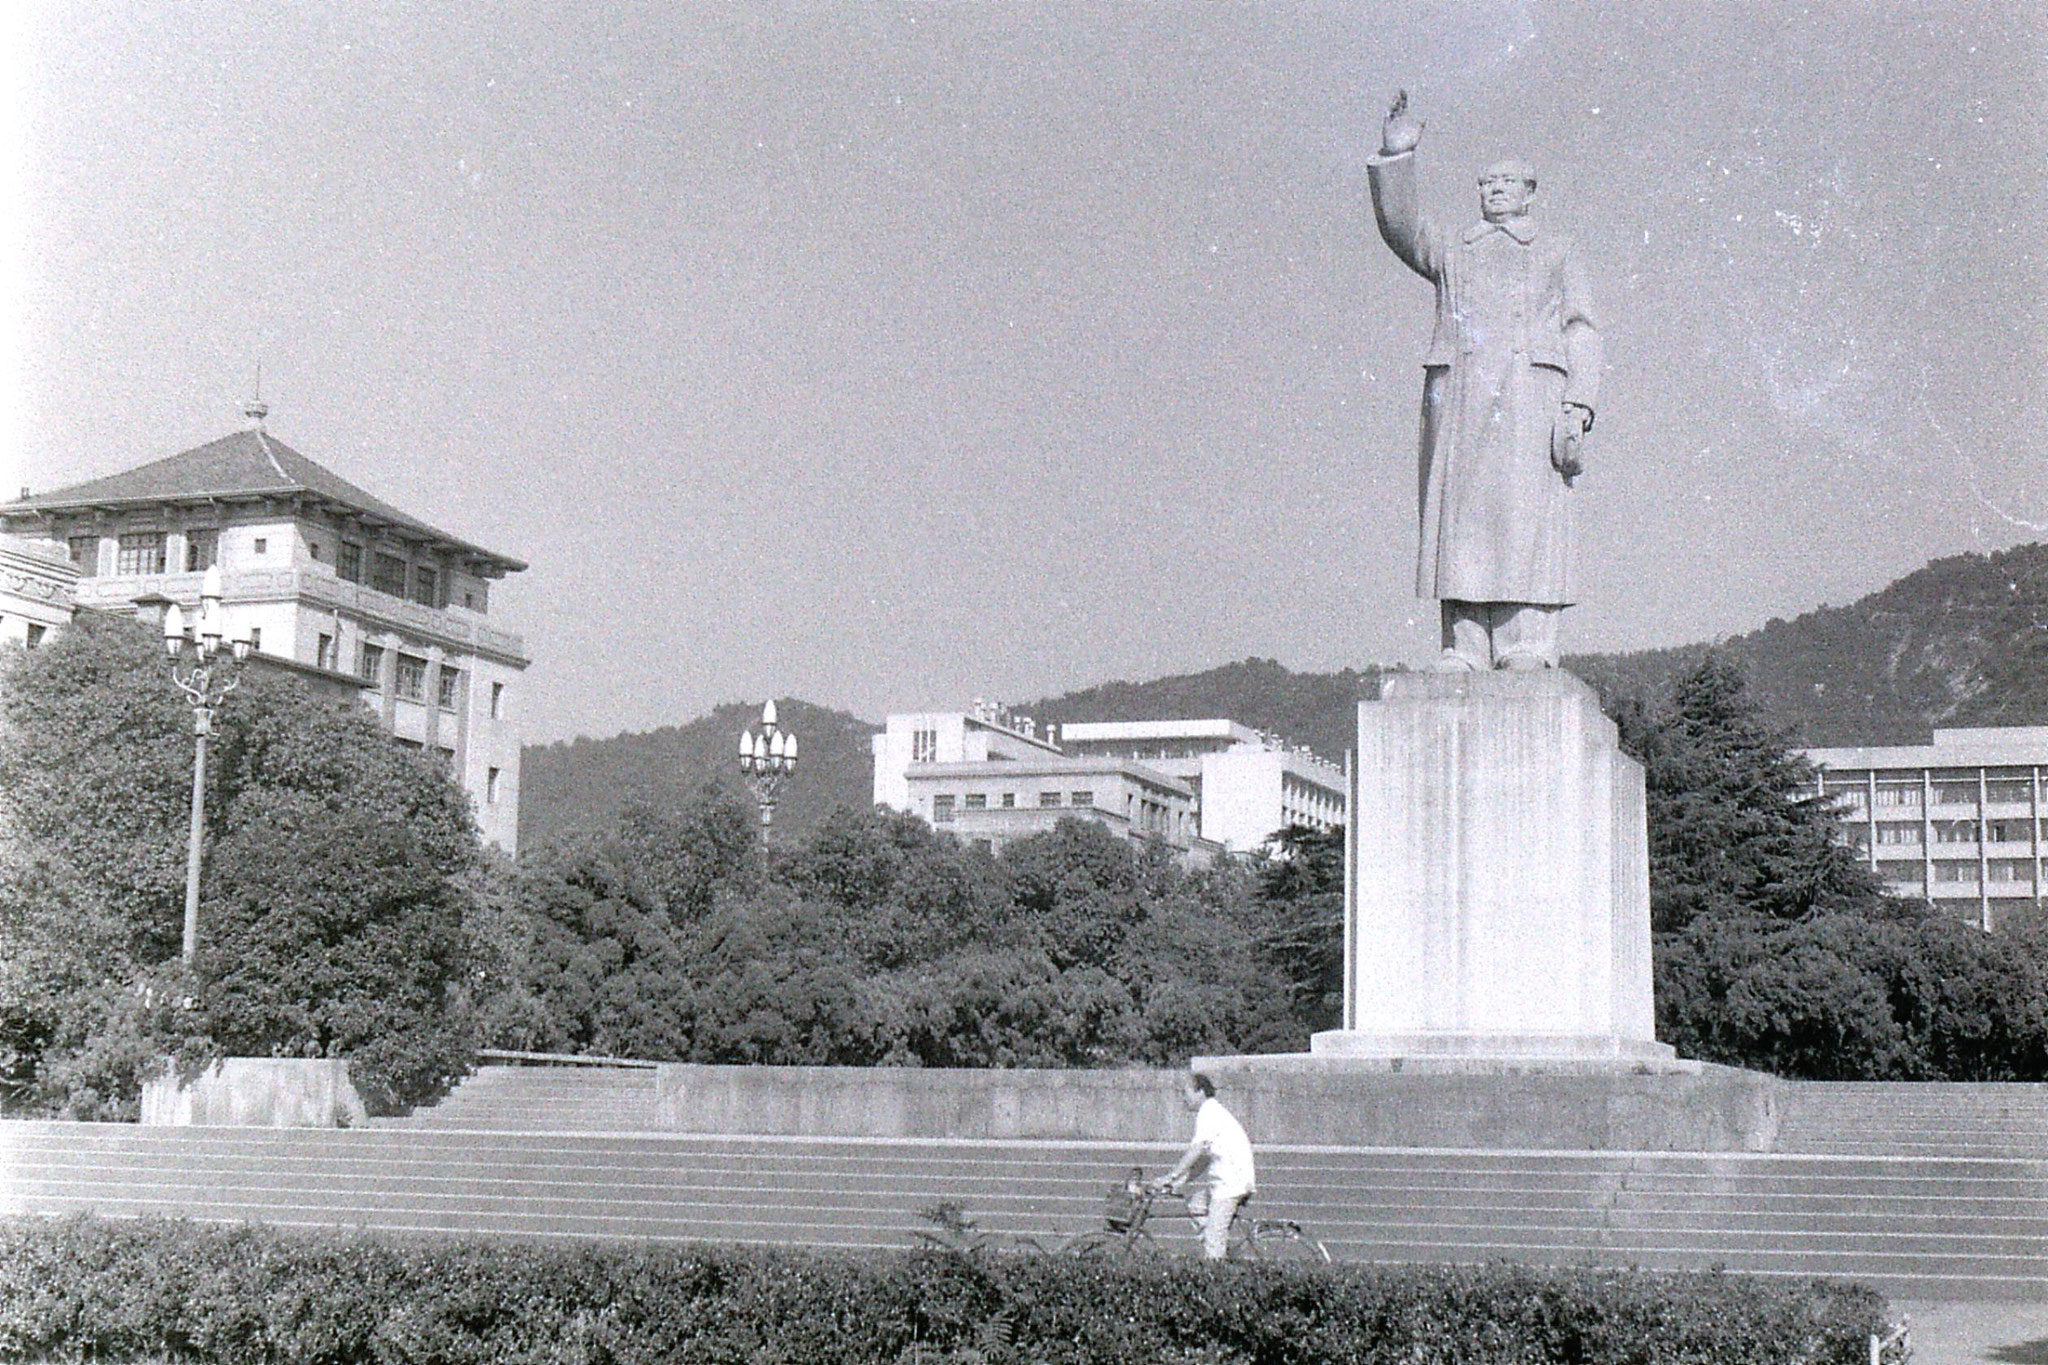 19/7/1989: 1: Hangzhou Mao statue